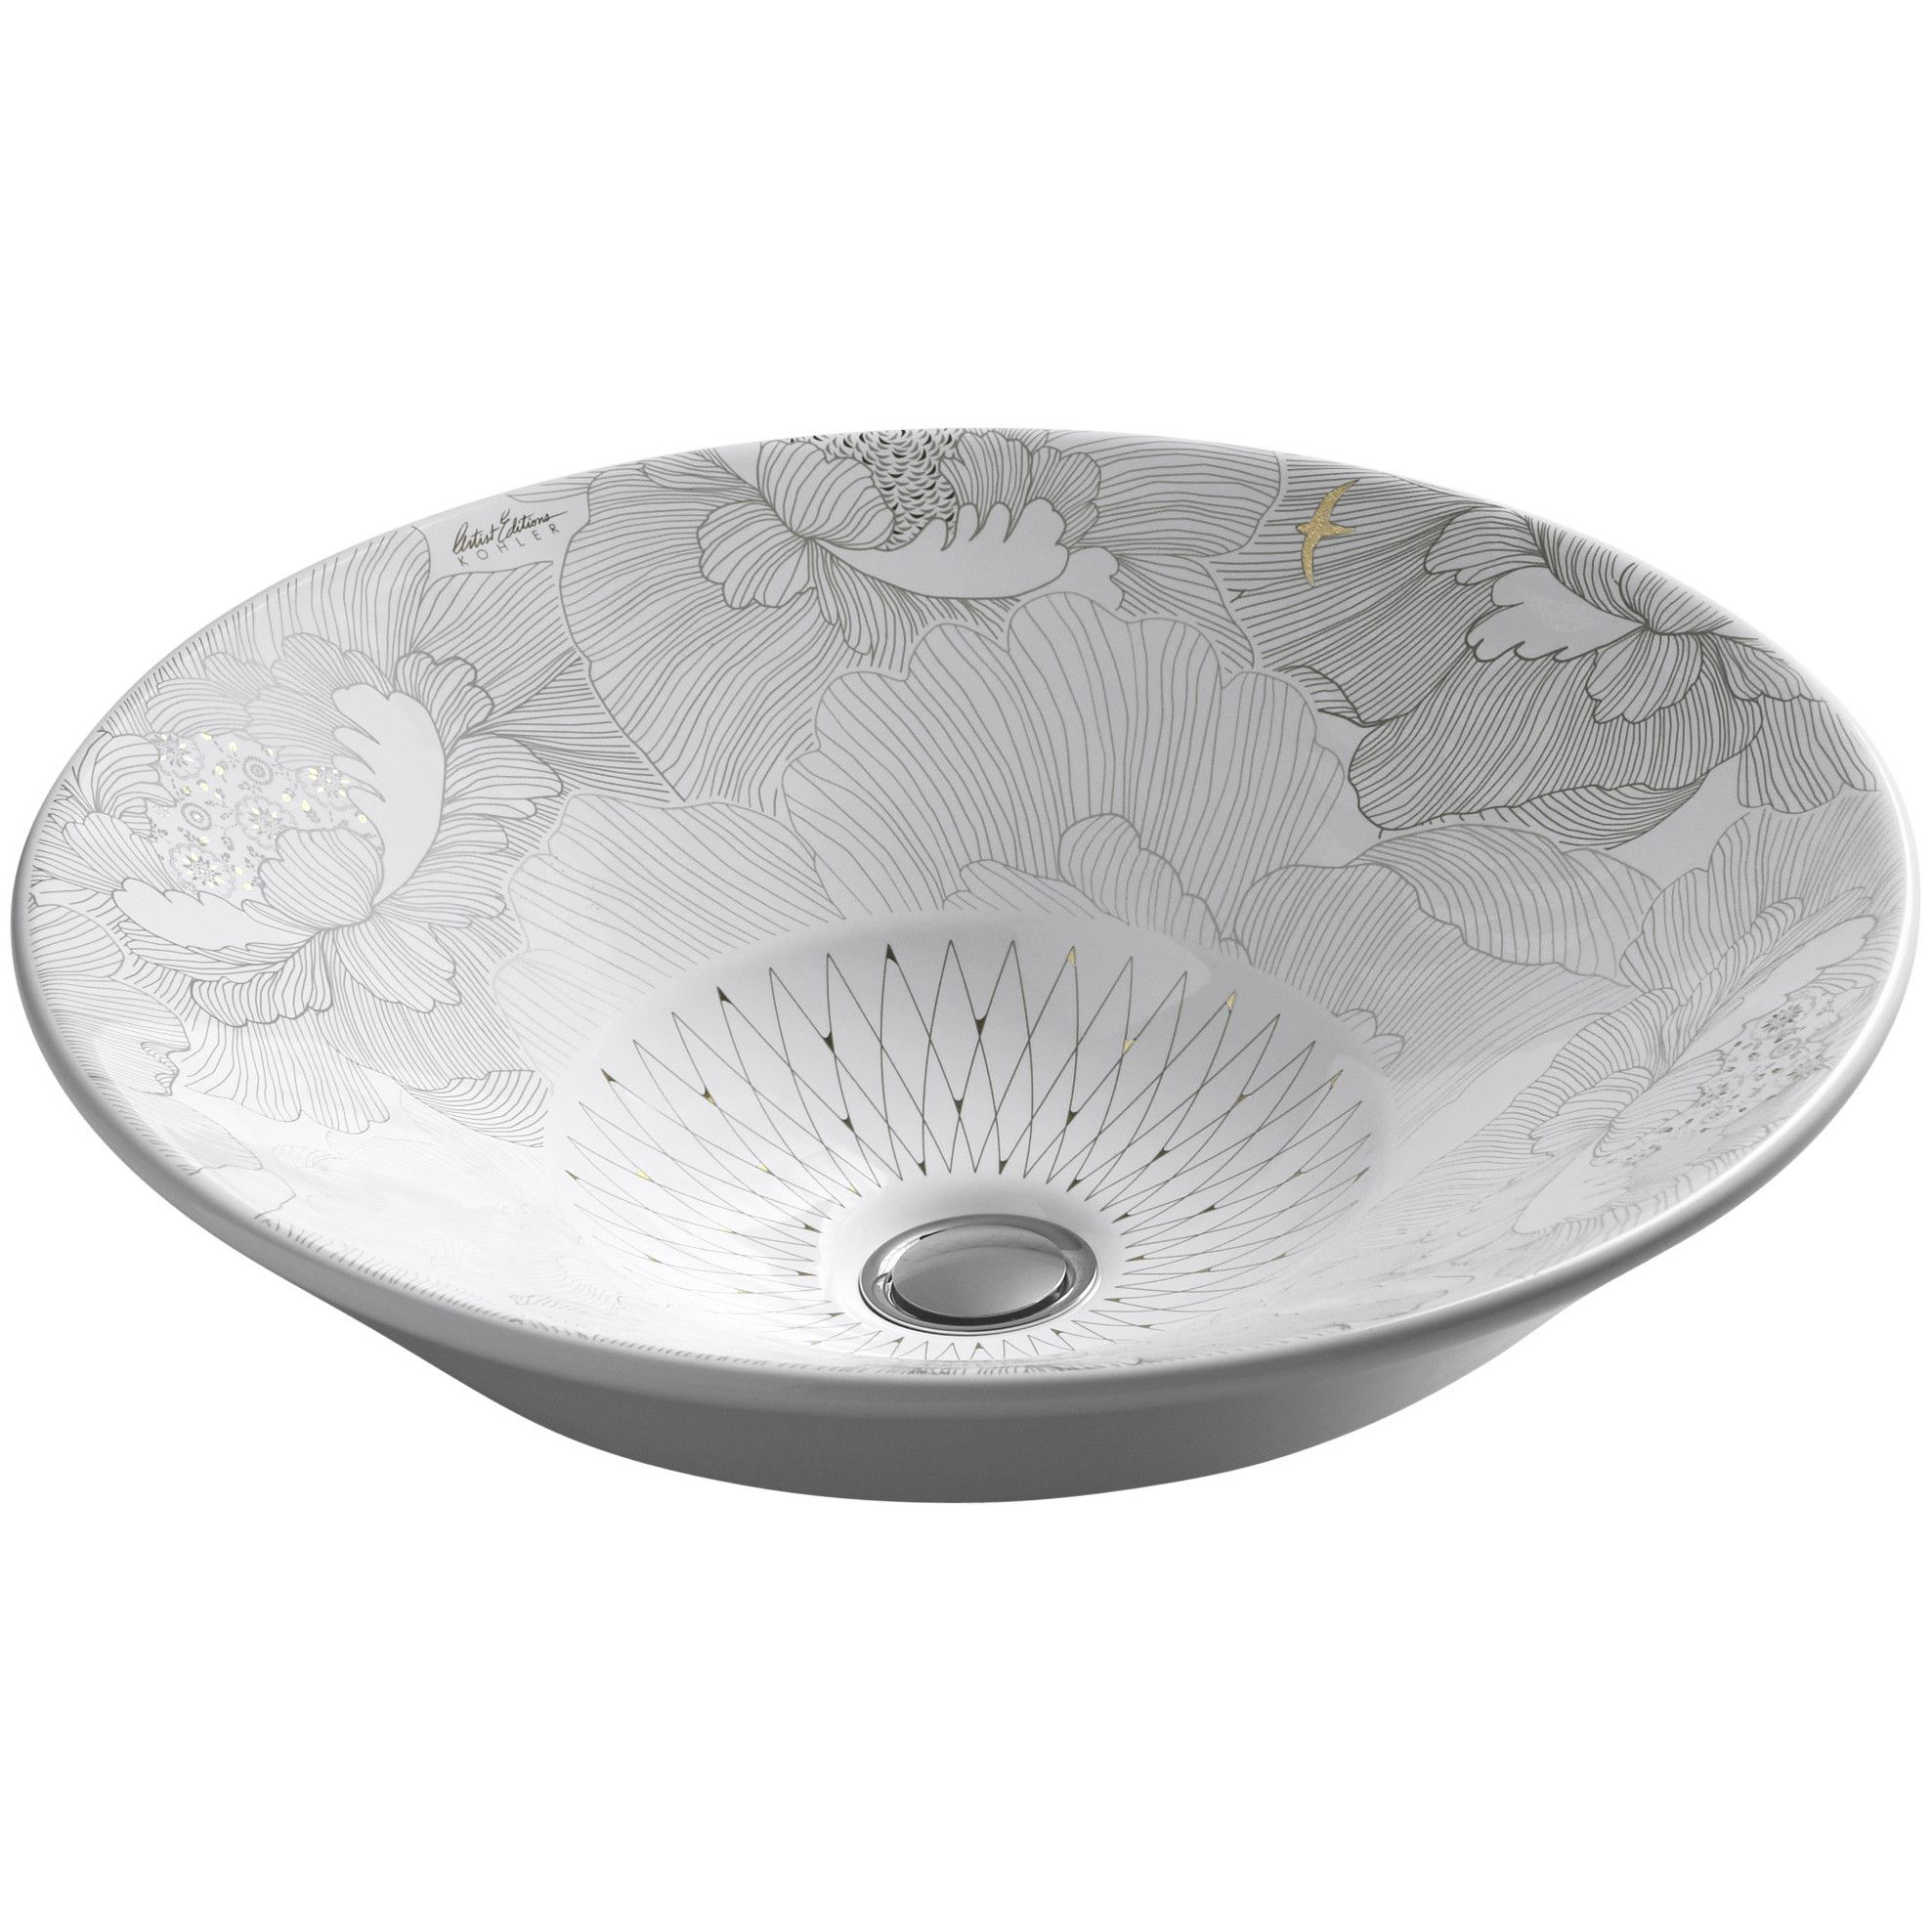 187 kitchen 187 kitchen sinks 187 nativestone 187 farmhouse double bowl - Kohler Empress Bouquet Design On Conical Bell Vessel Bathroom Sink